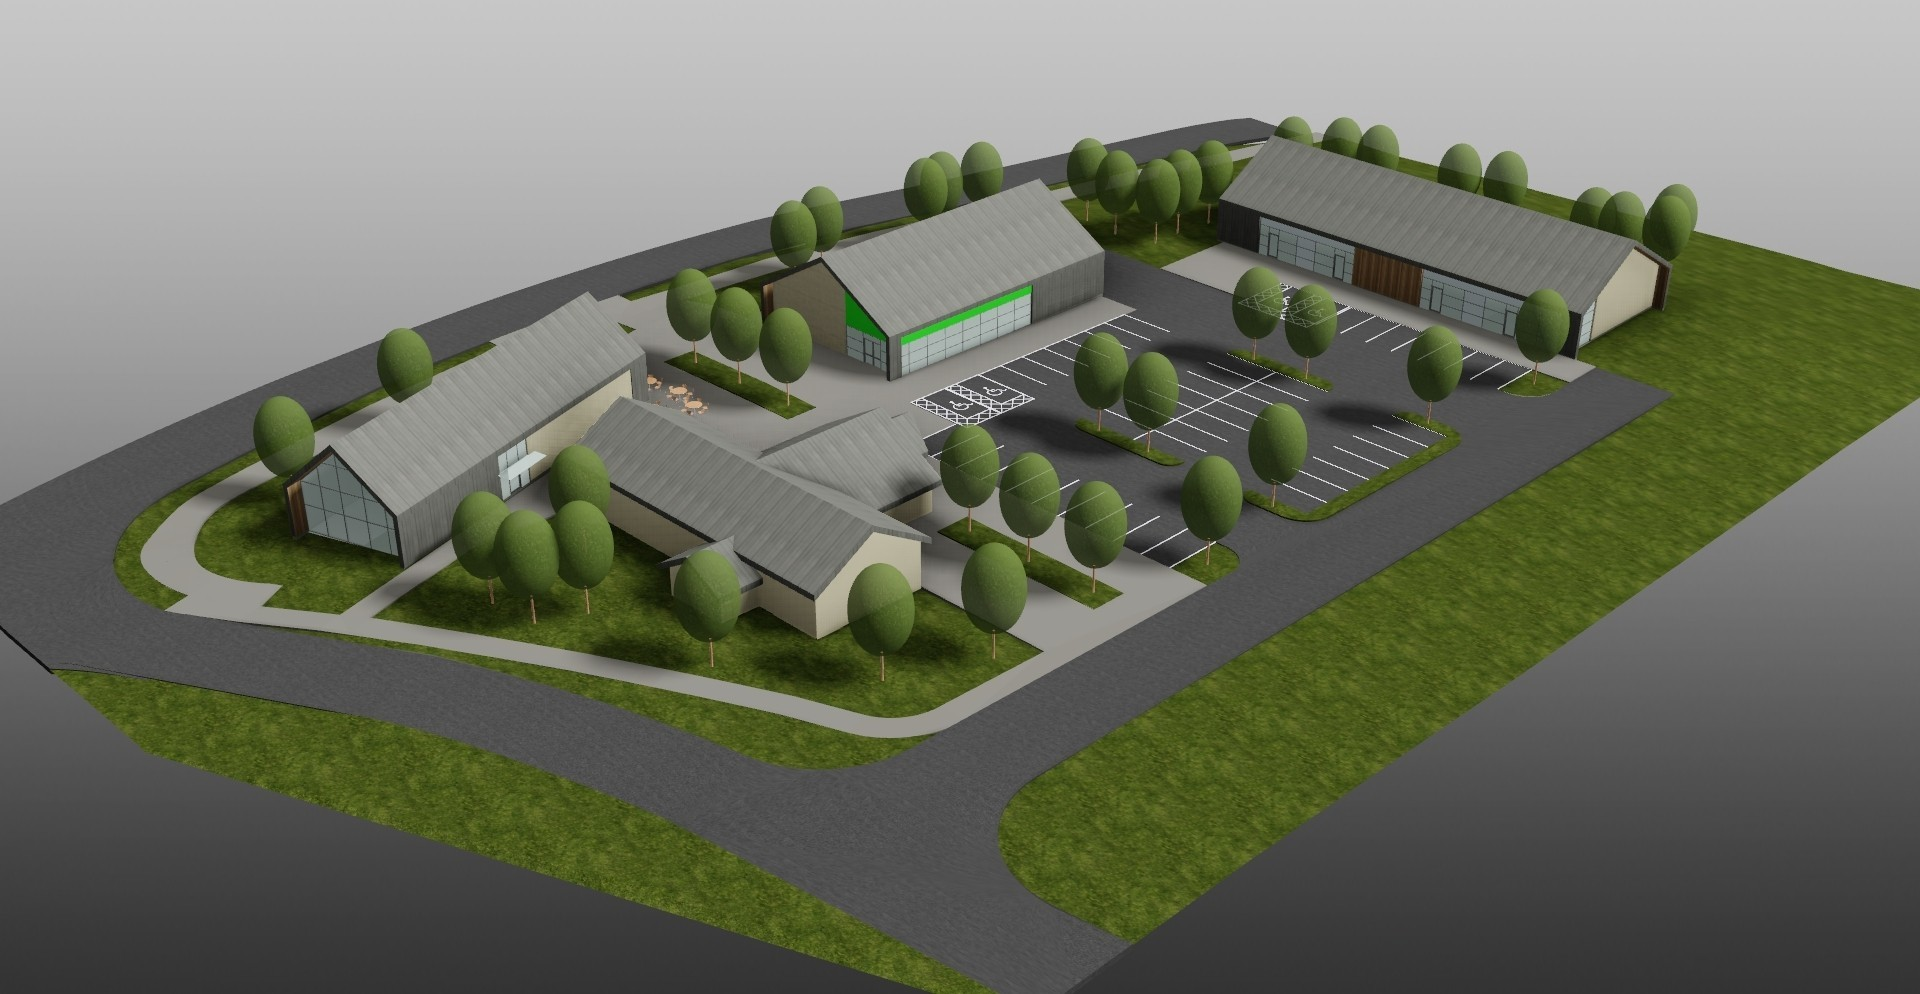 Plans for Bancon Homes' residential development.